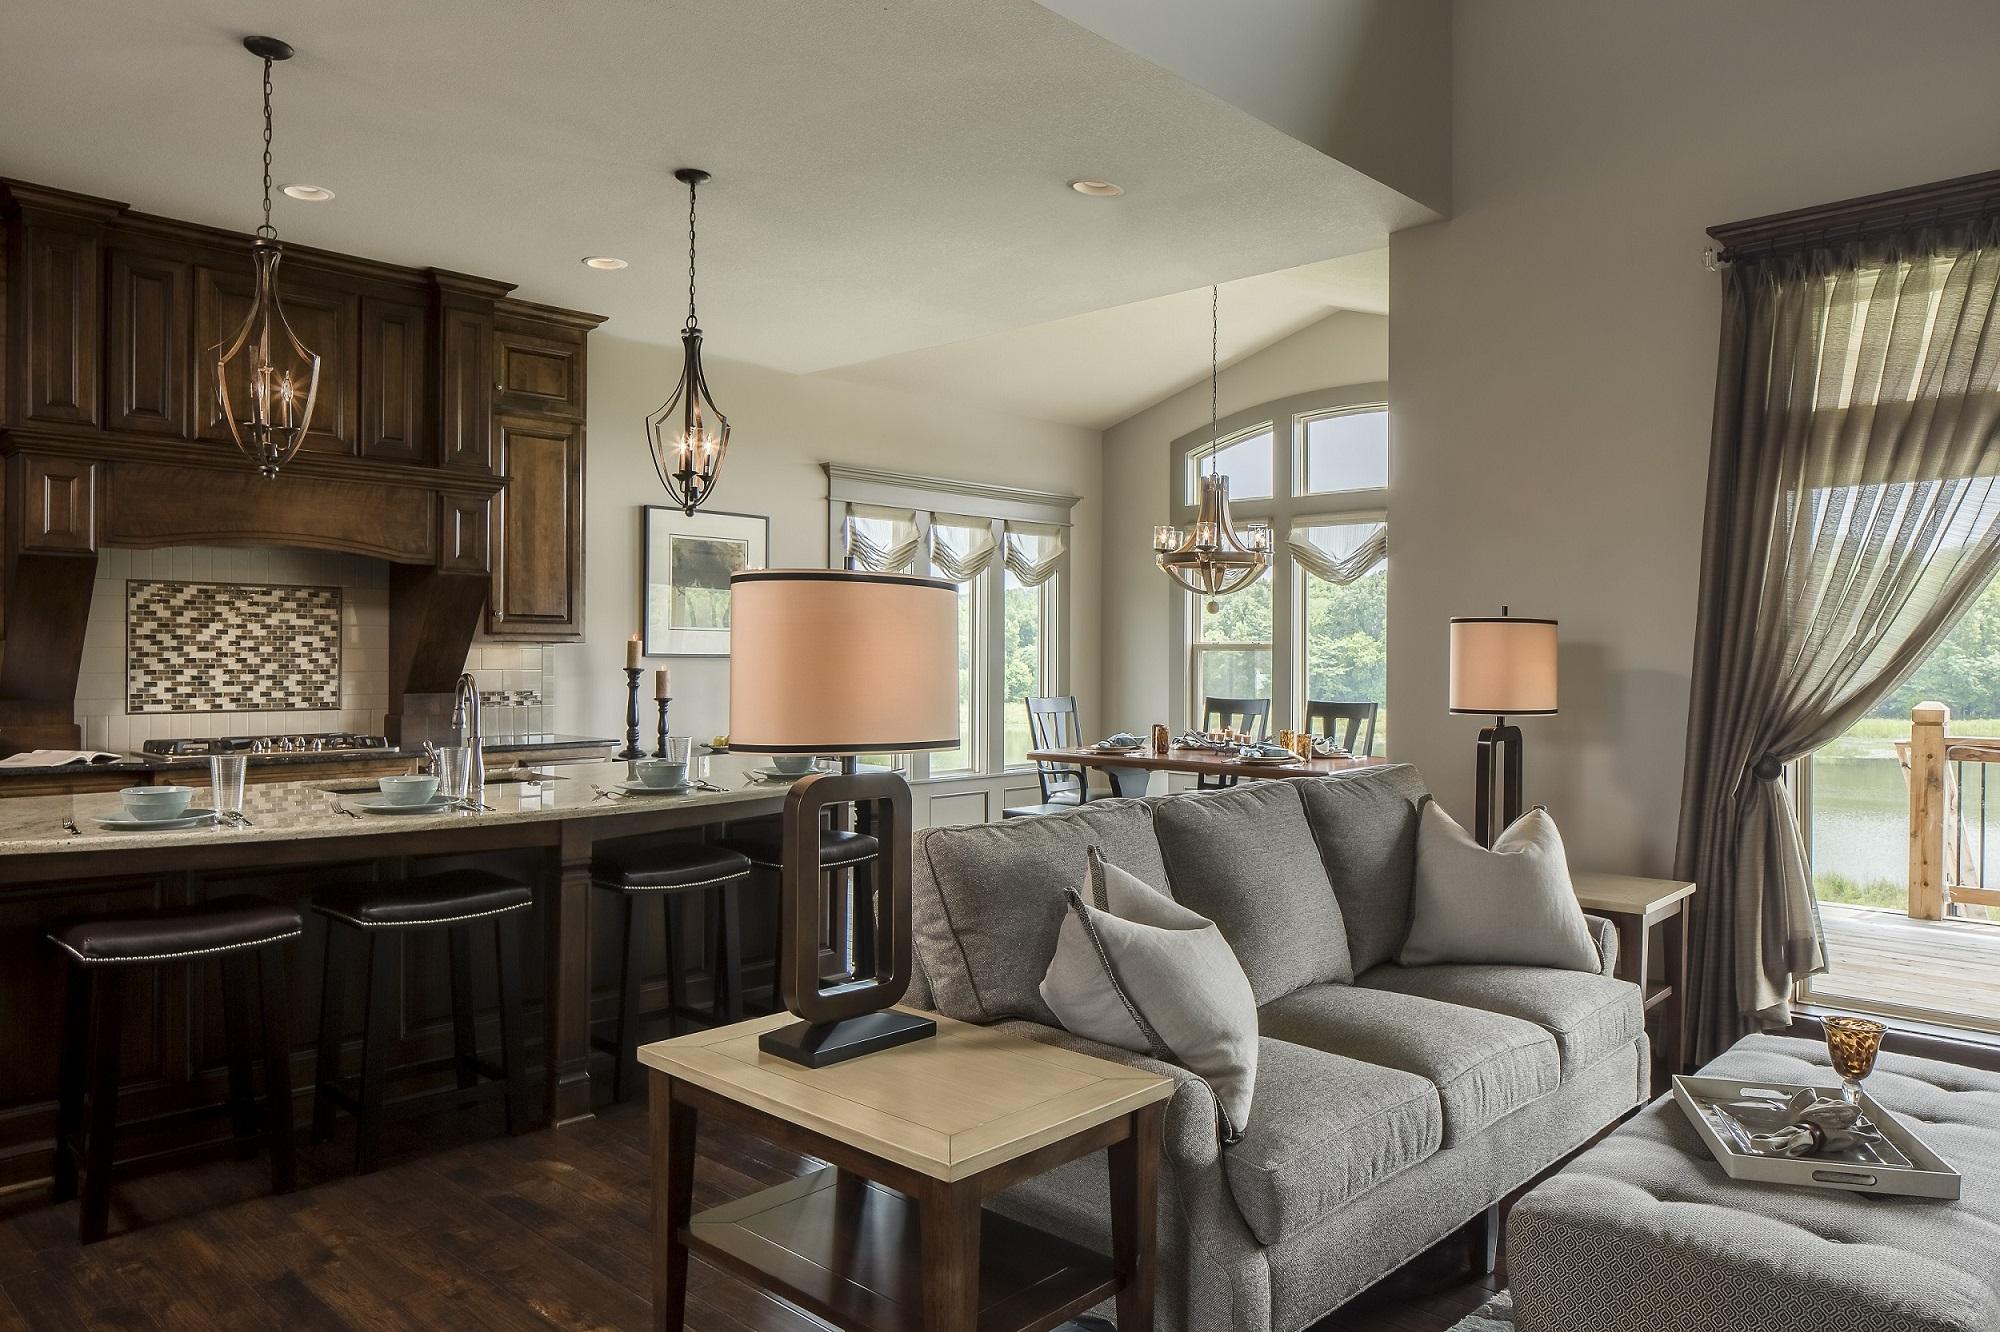 Kitchen Great Room Arlene Ladegaard Design Connection Inc Kansas City Interior Designer